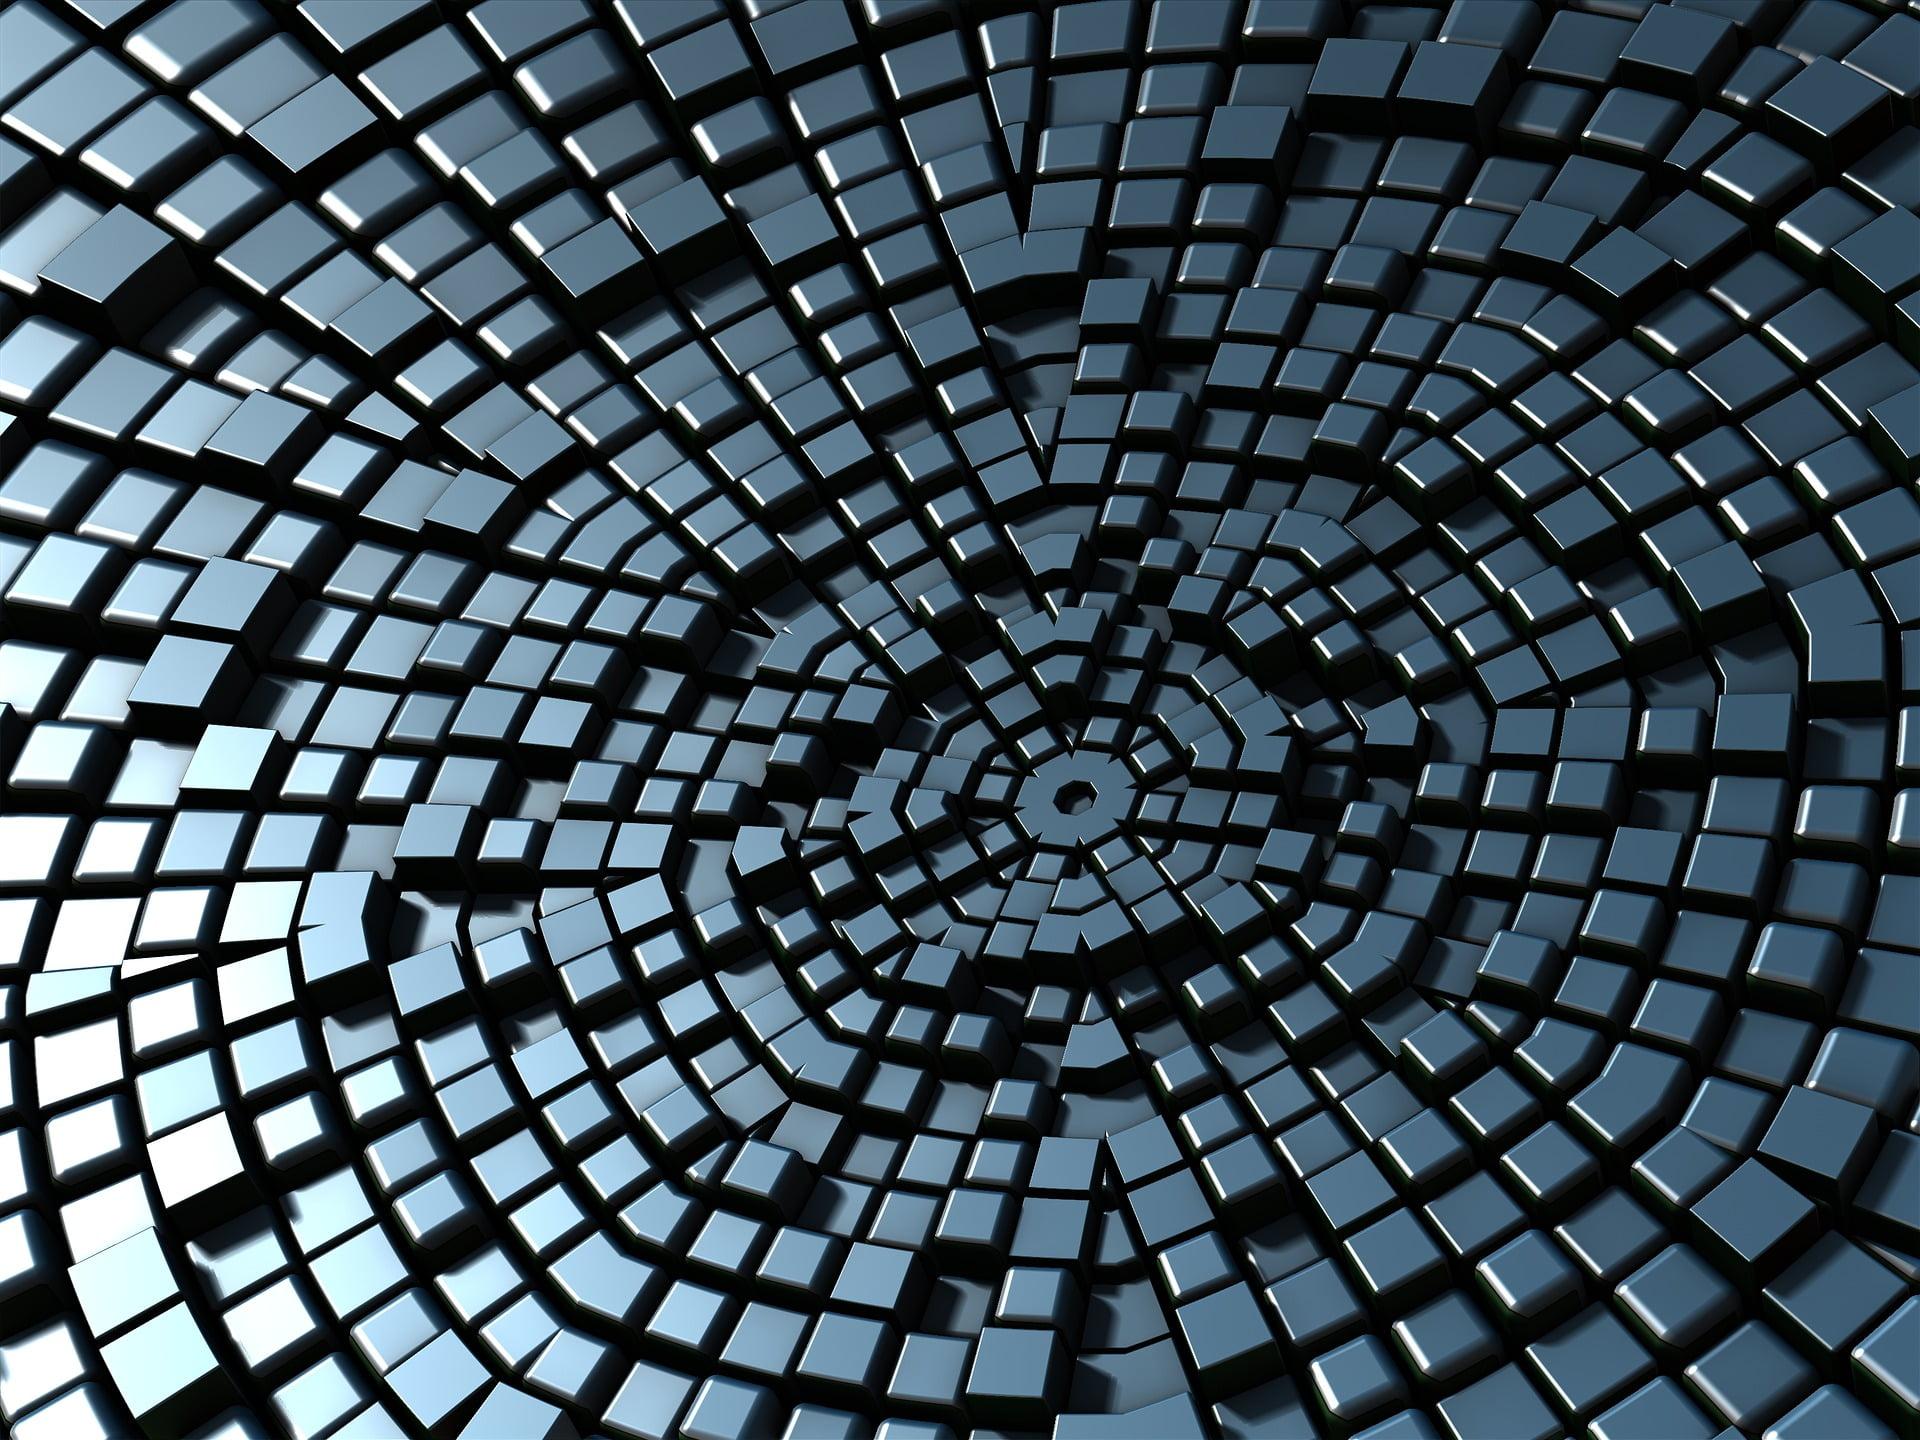 Buterin: niektóre zastosowania blockchain to strata czasu